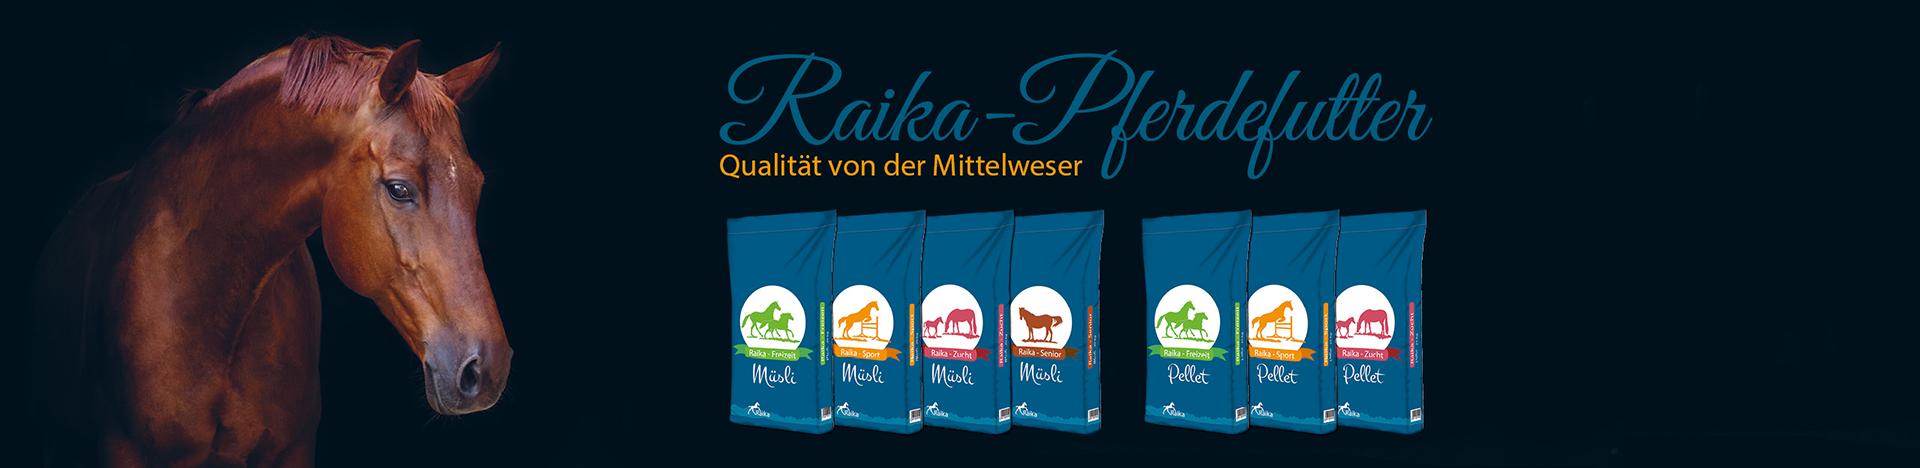 Bannerbild Raika-Grundsortiment